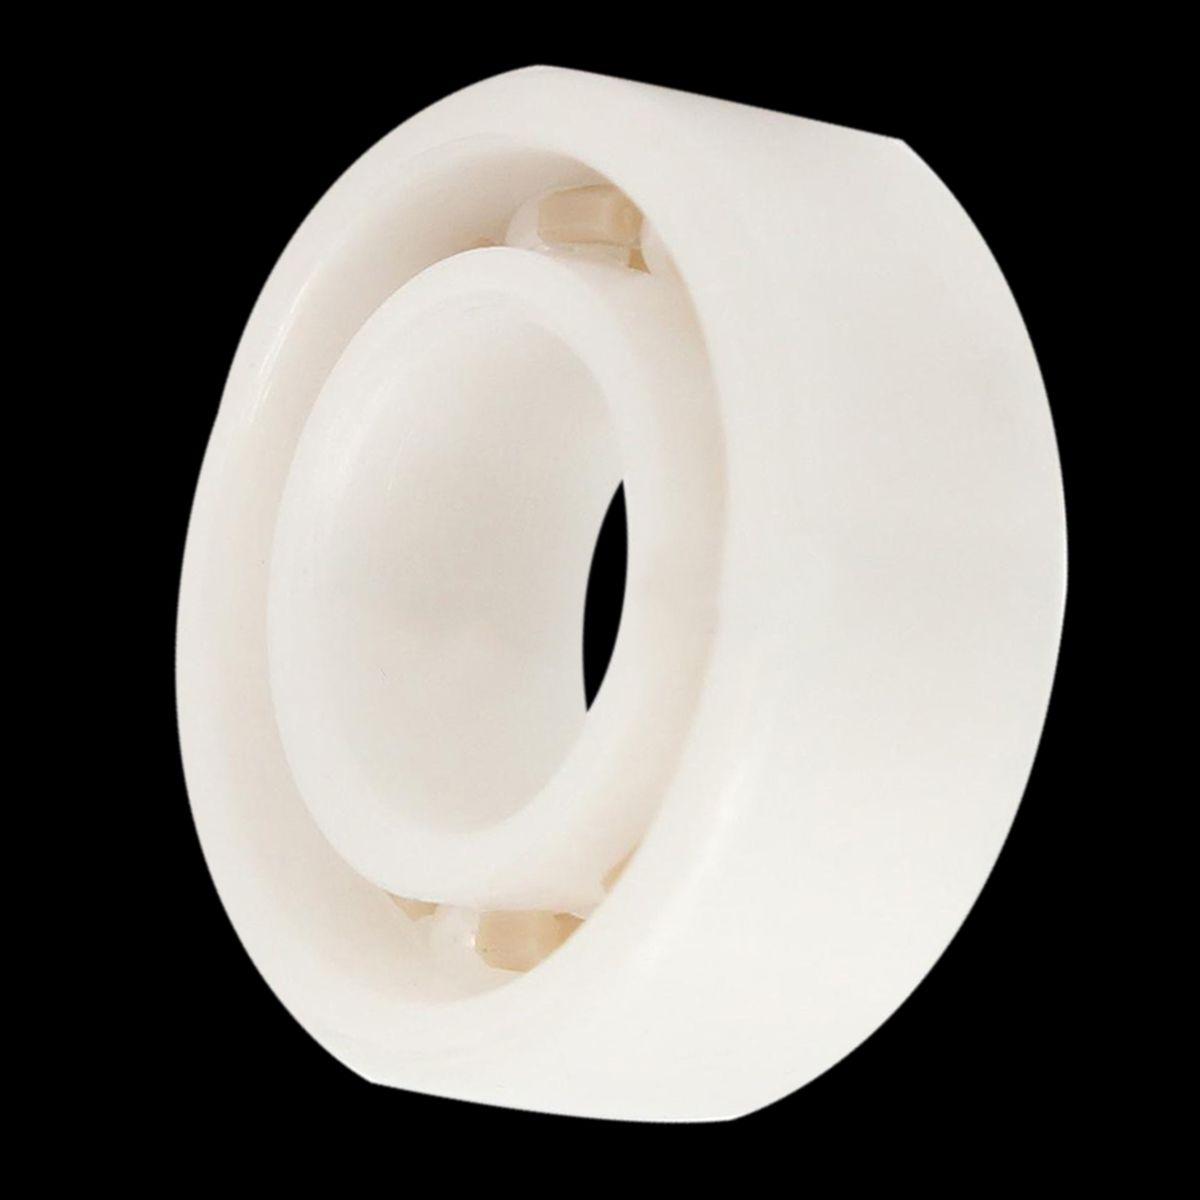 r188 bearing. r188 ceramic bearing 1/4x1/2x3/16 inch ball cearmic skate fidget spinner zro2 online with $11.42/piece on